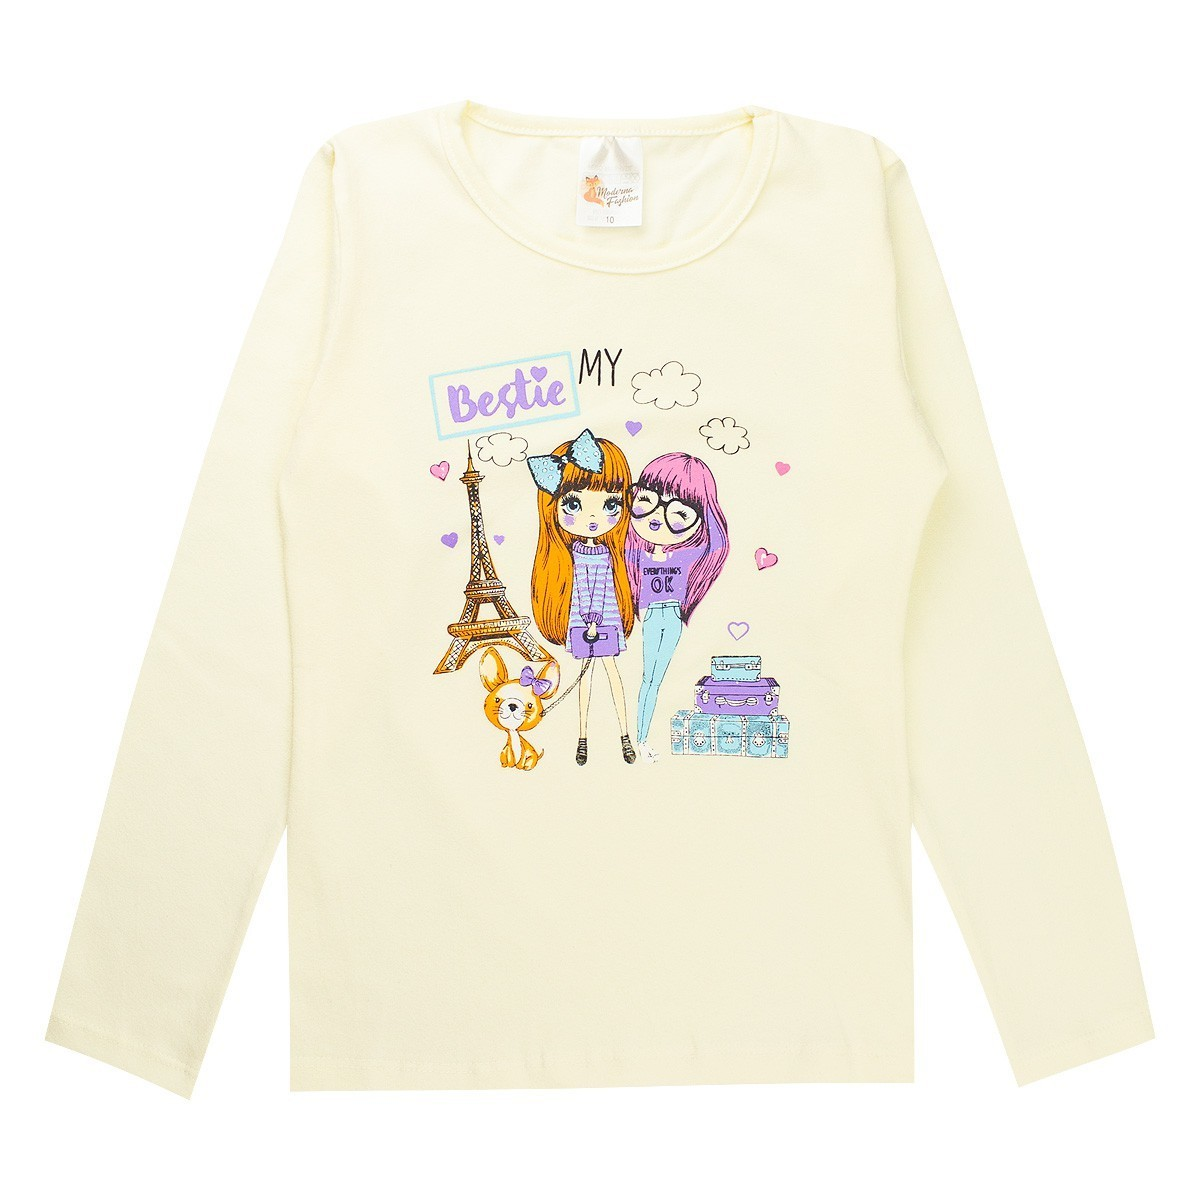 Conjunto Infantil Menina Estampado Cotton My bestie - Bege